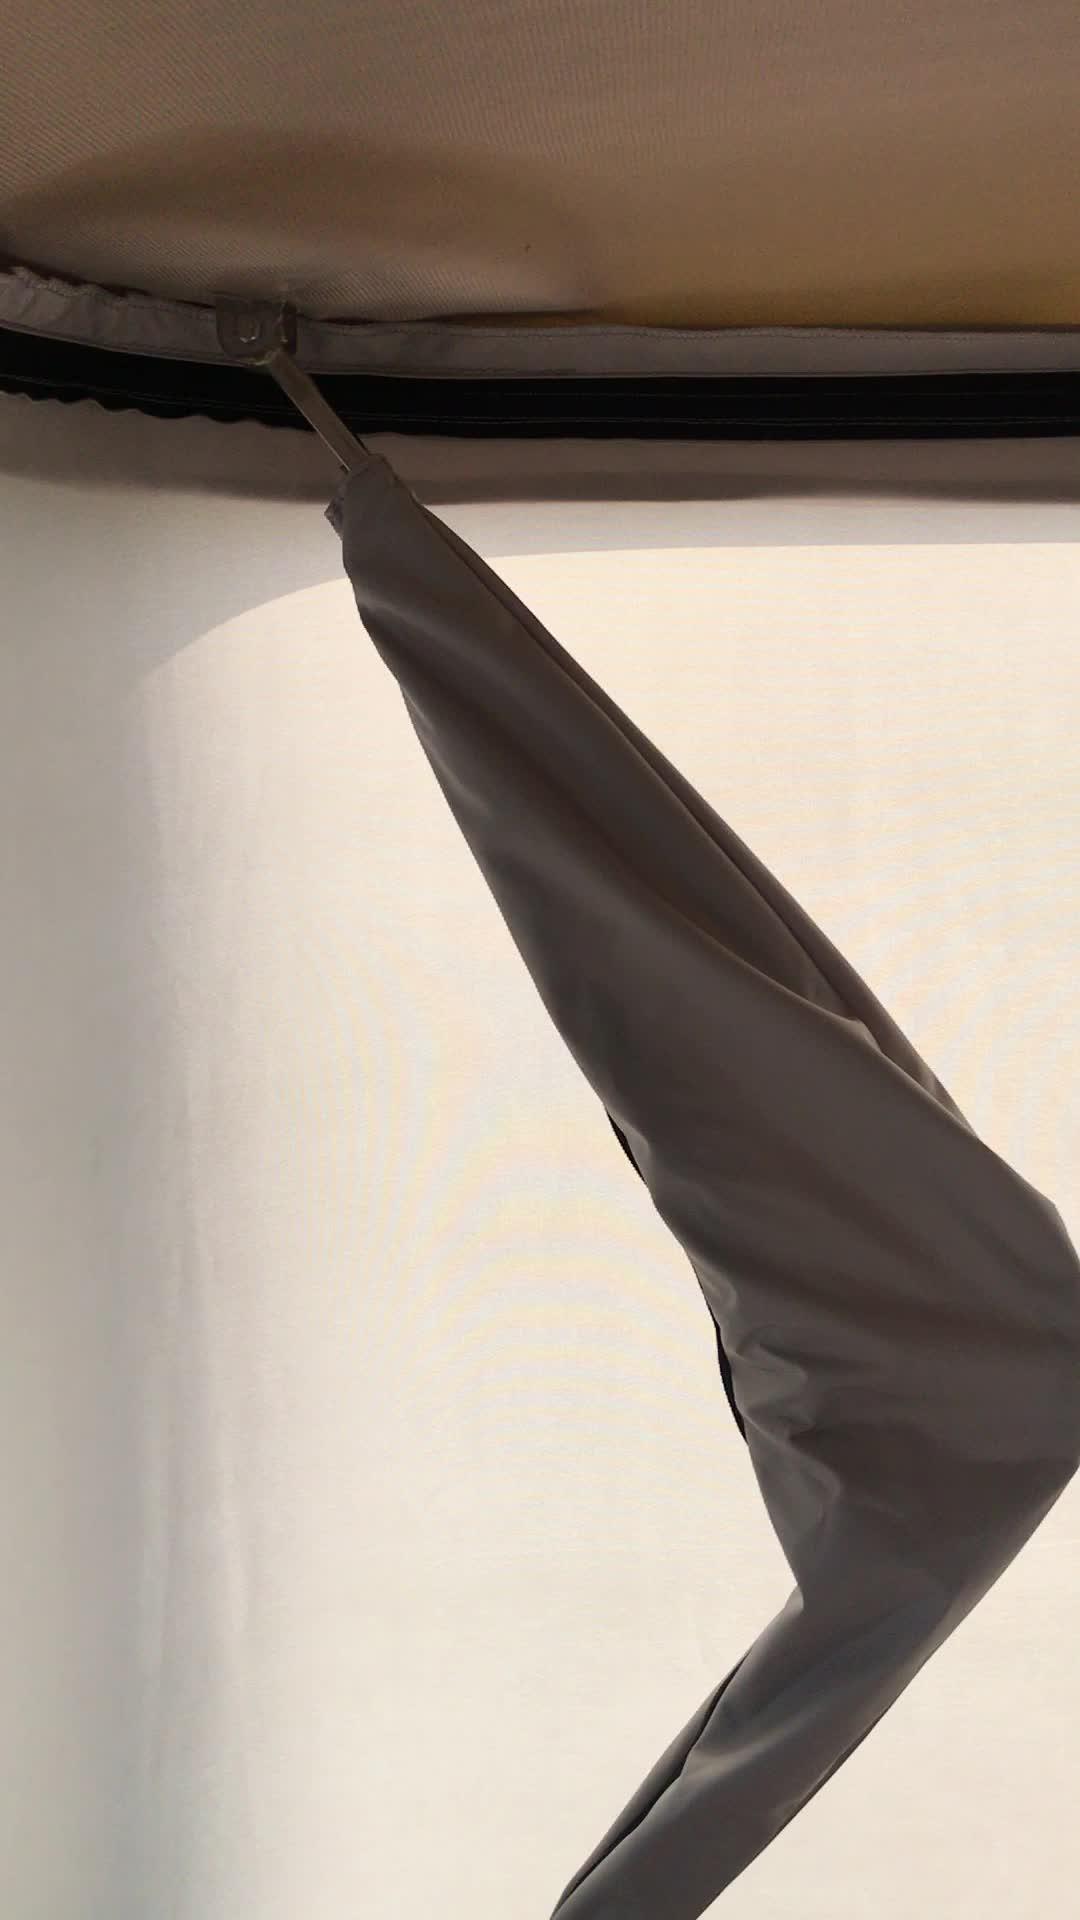 Hoge Kwaliteit Nieuwe Ontwerp Dak Tent Hard Shell 2 Persoon